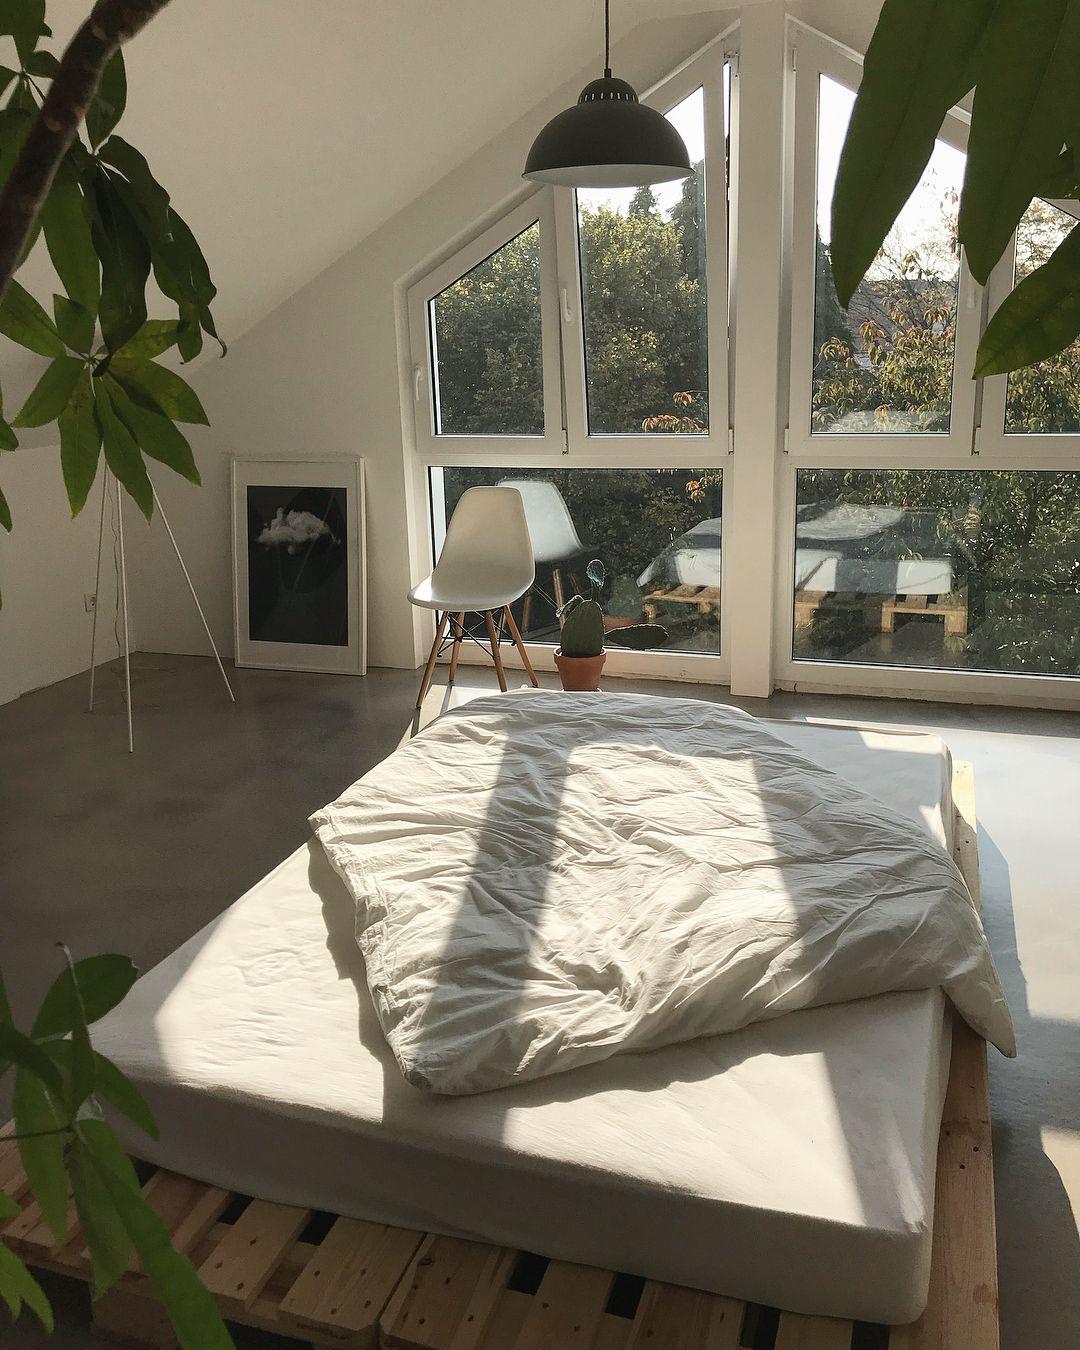 Pin van Abisinuola 👑 op Home | Pinterest - Woonideeën, Interieur en ...